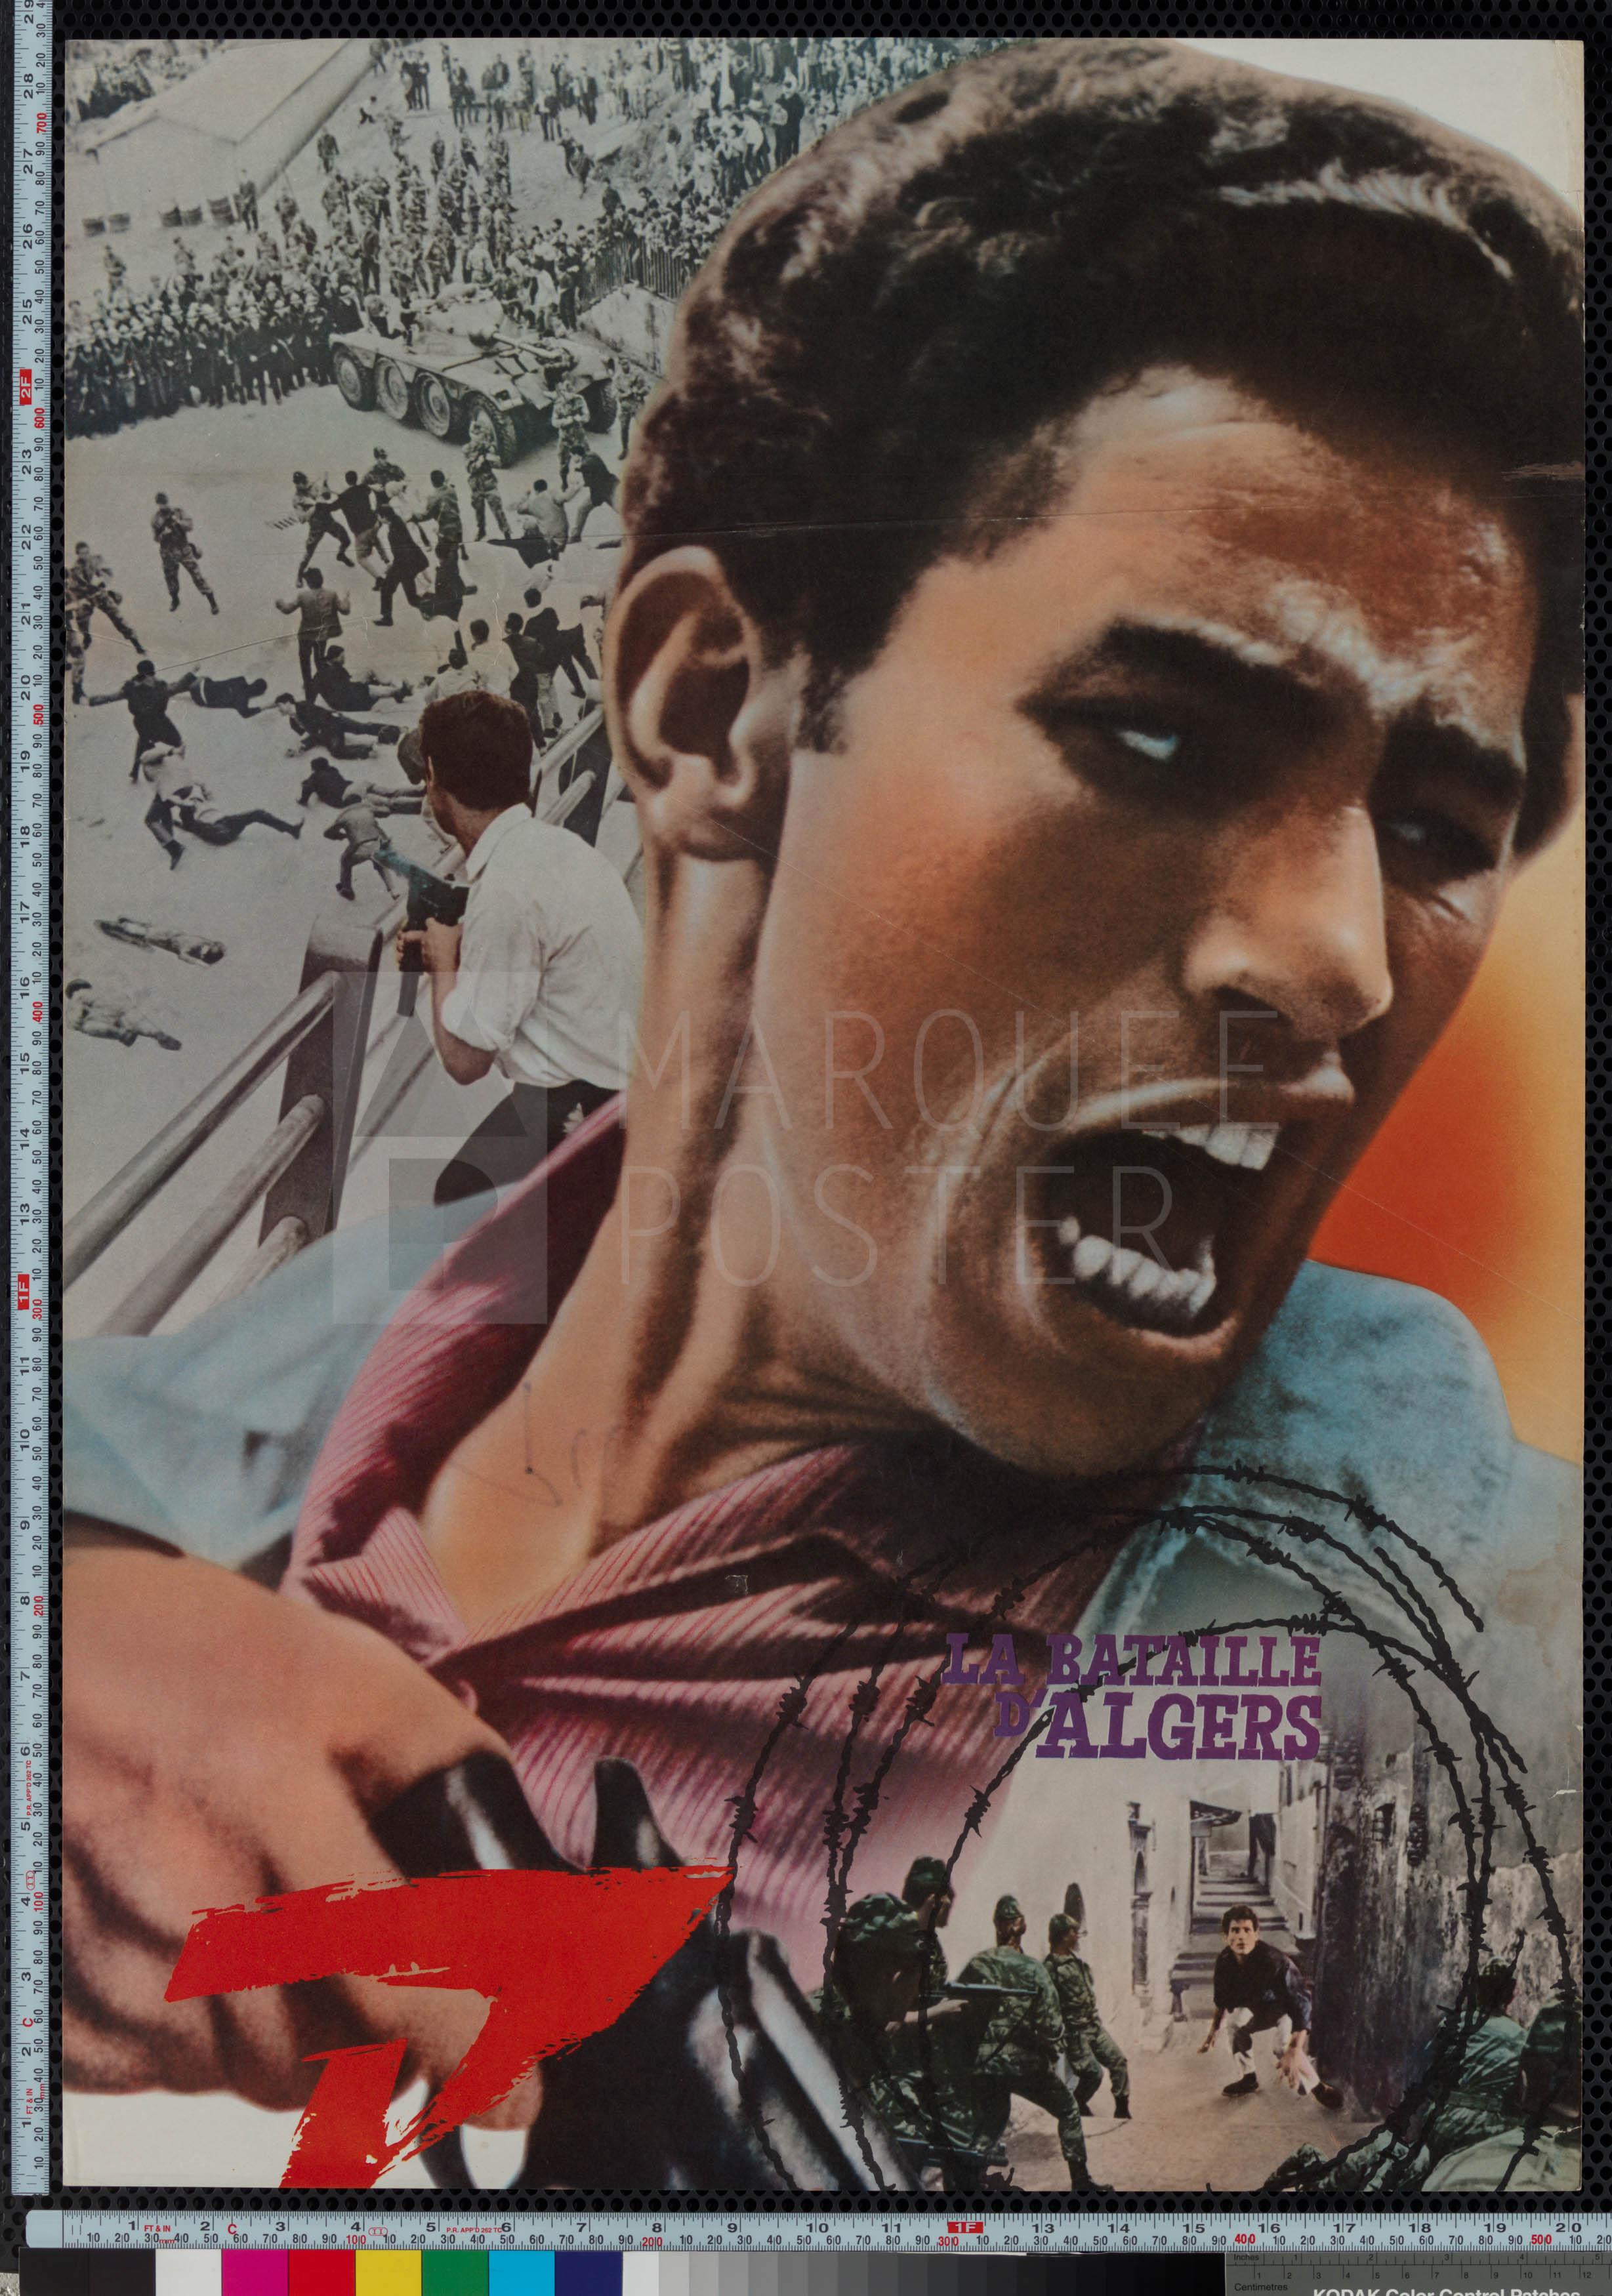 24-battle-of-algiers-japanese-stb-1967-02